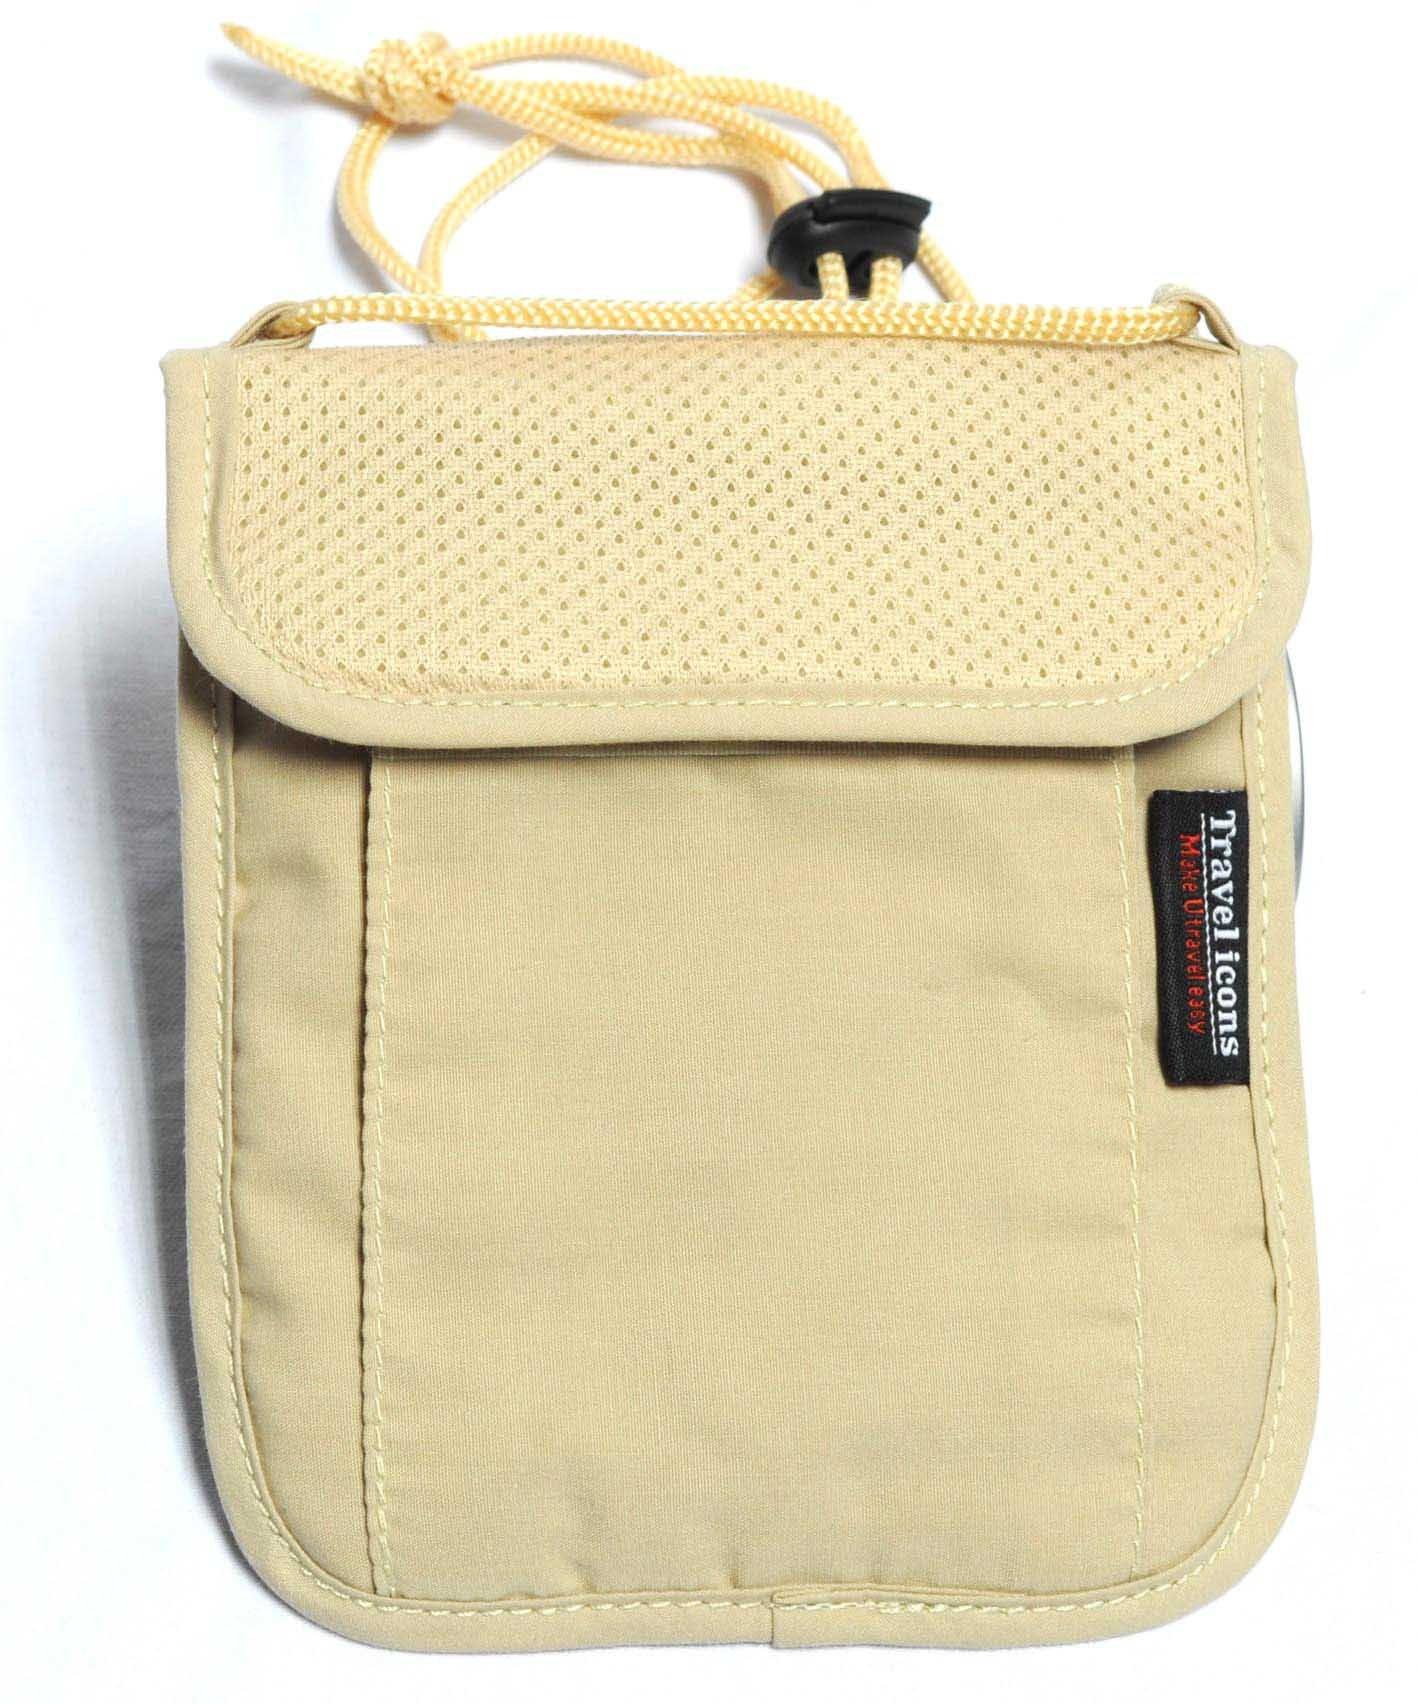 Free shipping travel gear hidden pocket money purse neck stash travel pouch passport bag for Travel gear hidden pocket